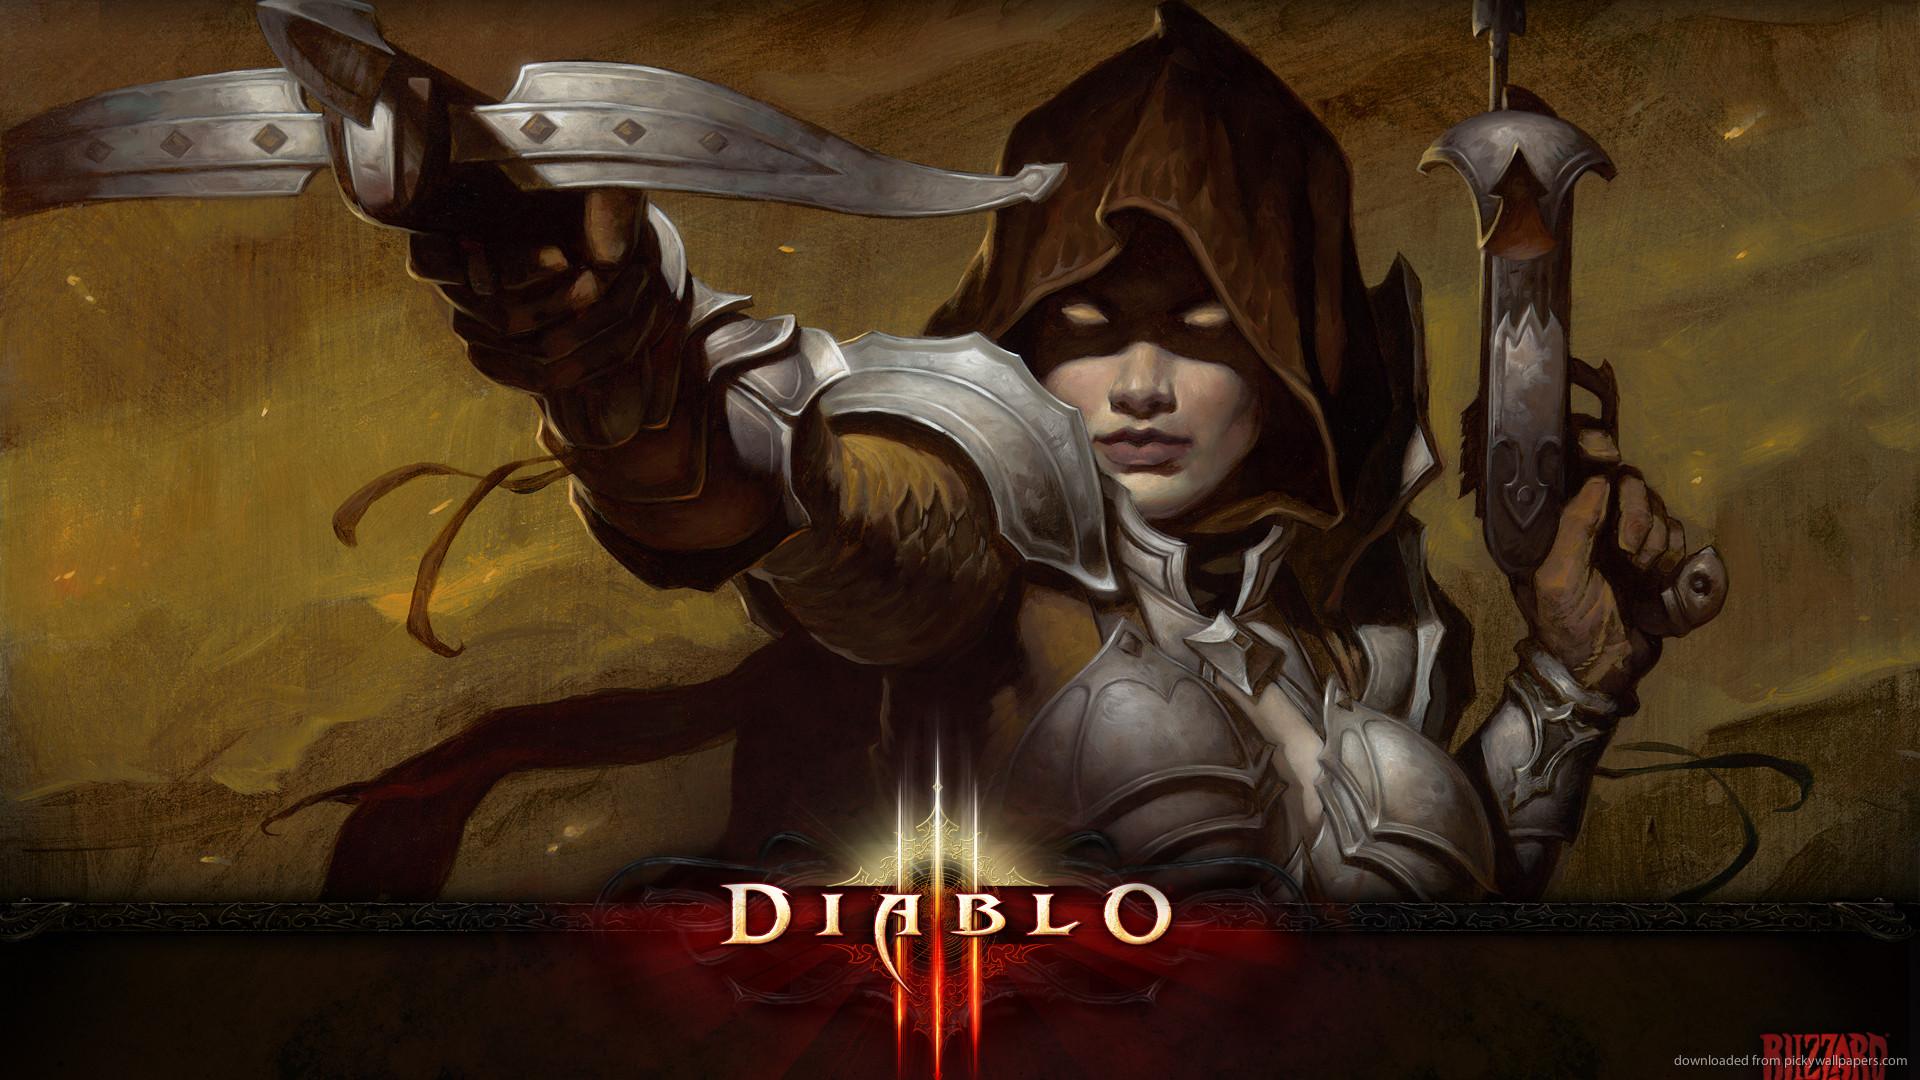 https://wallpaper.pickywallpapers.com/1920×1080/diablo-3-unlocked-exclusive- demon-hunter.jpg   Illustration   Pinterest   Diablo demon hunter, Demon  hunter …